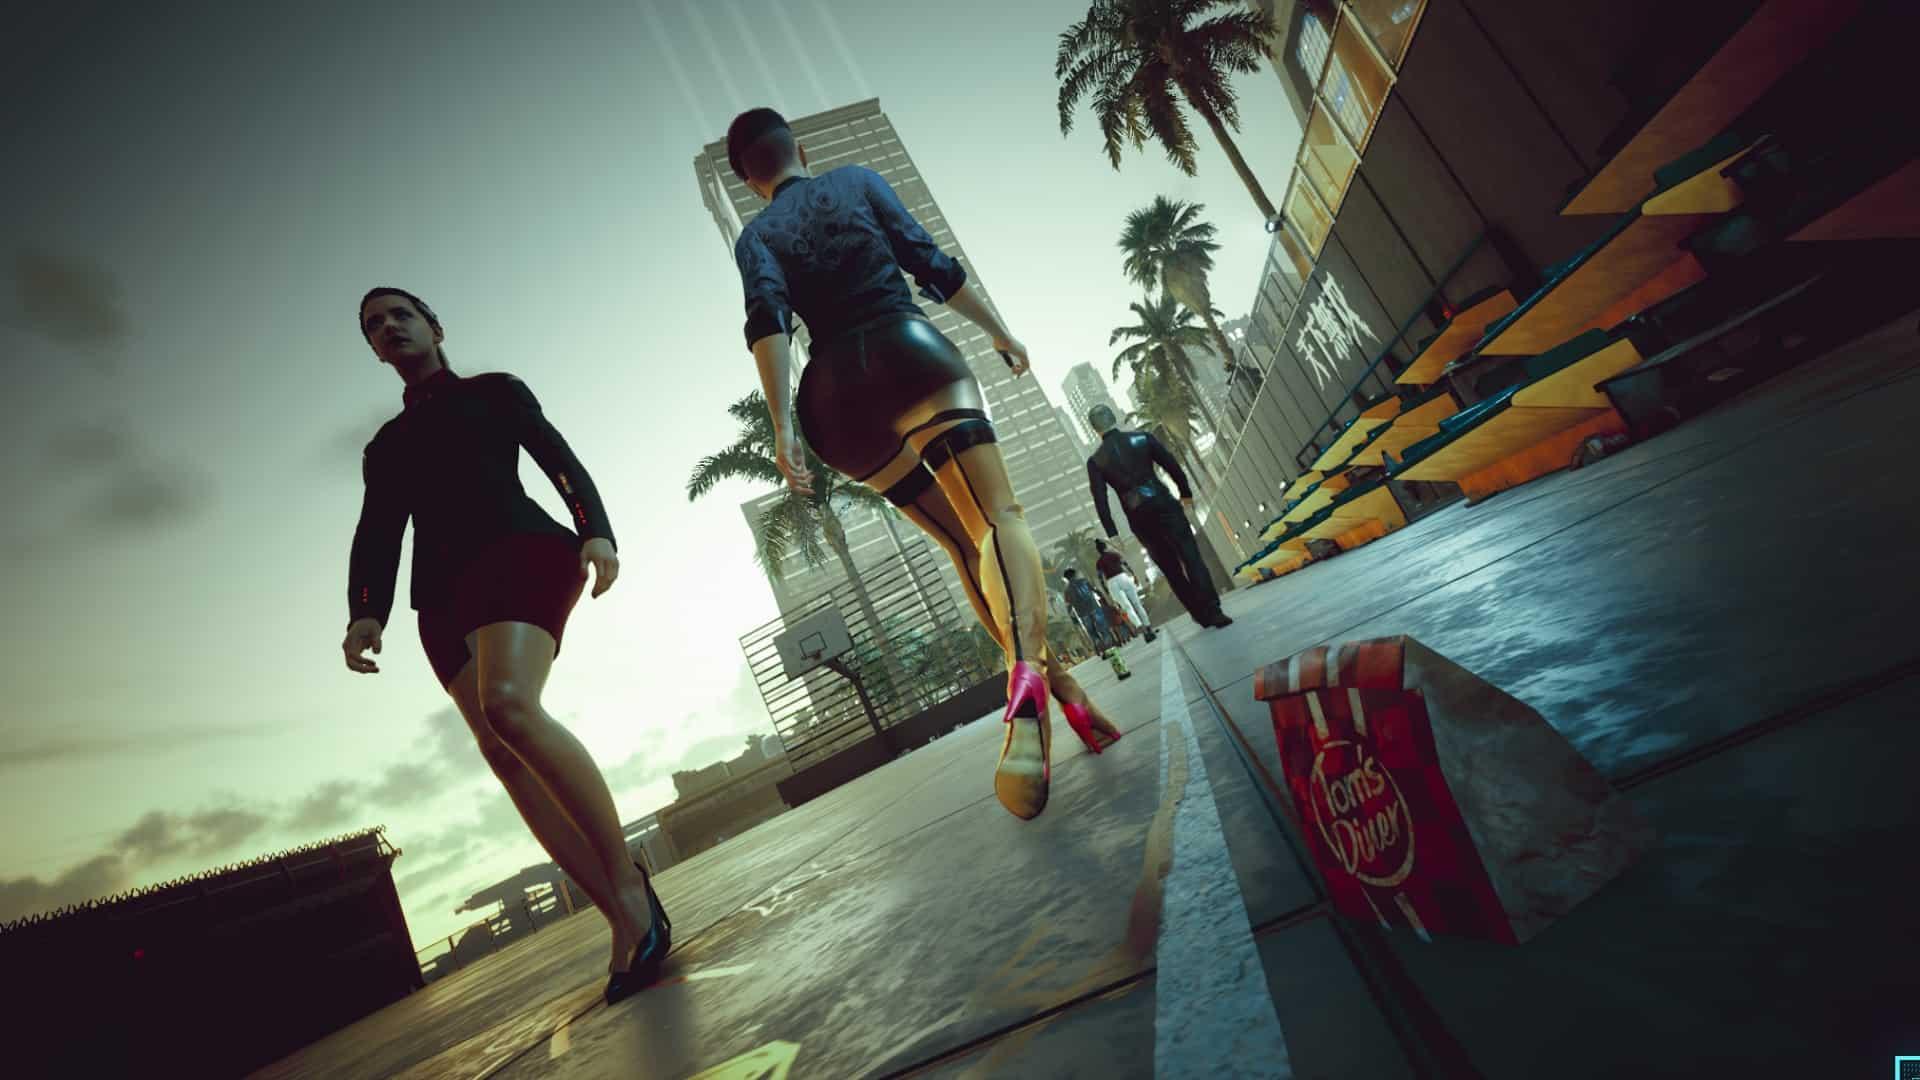 Female Vs Less Ugly Feet at Cyberpunk 2077 Nexus - Mods